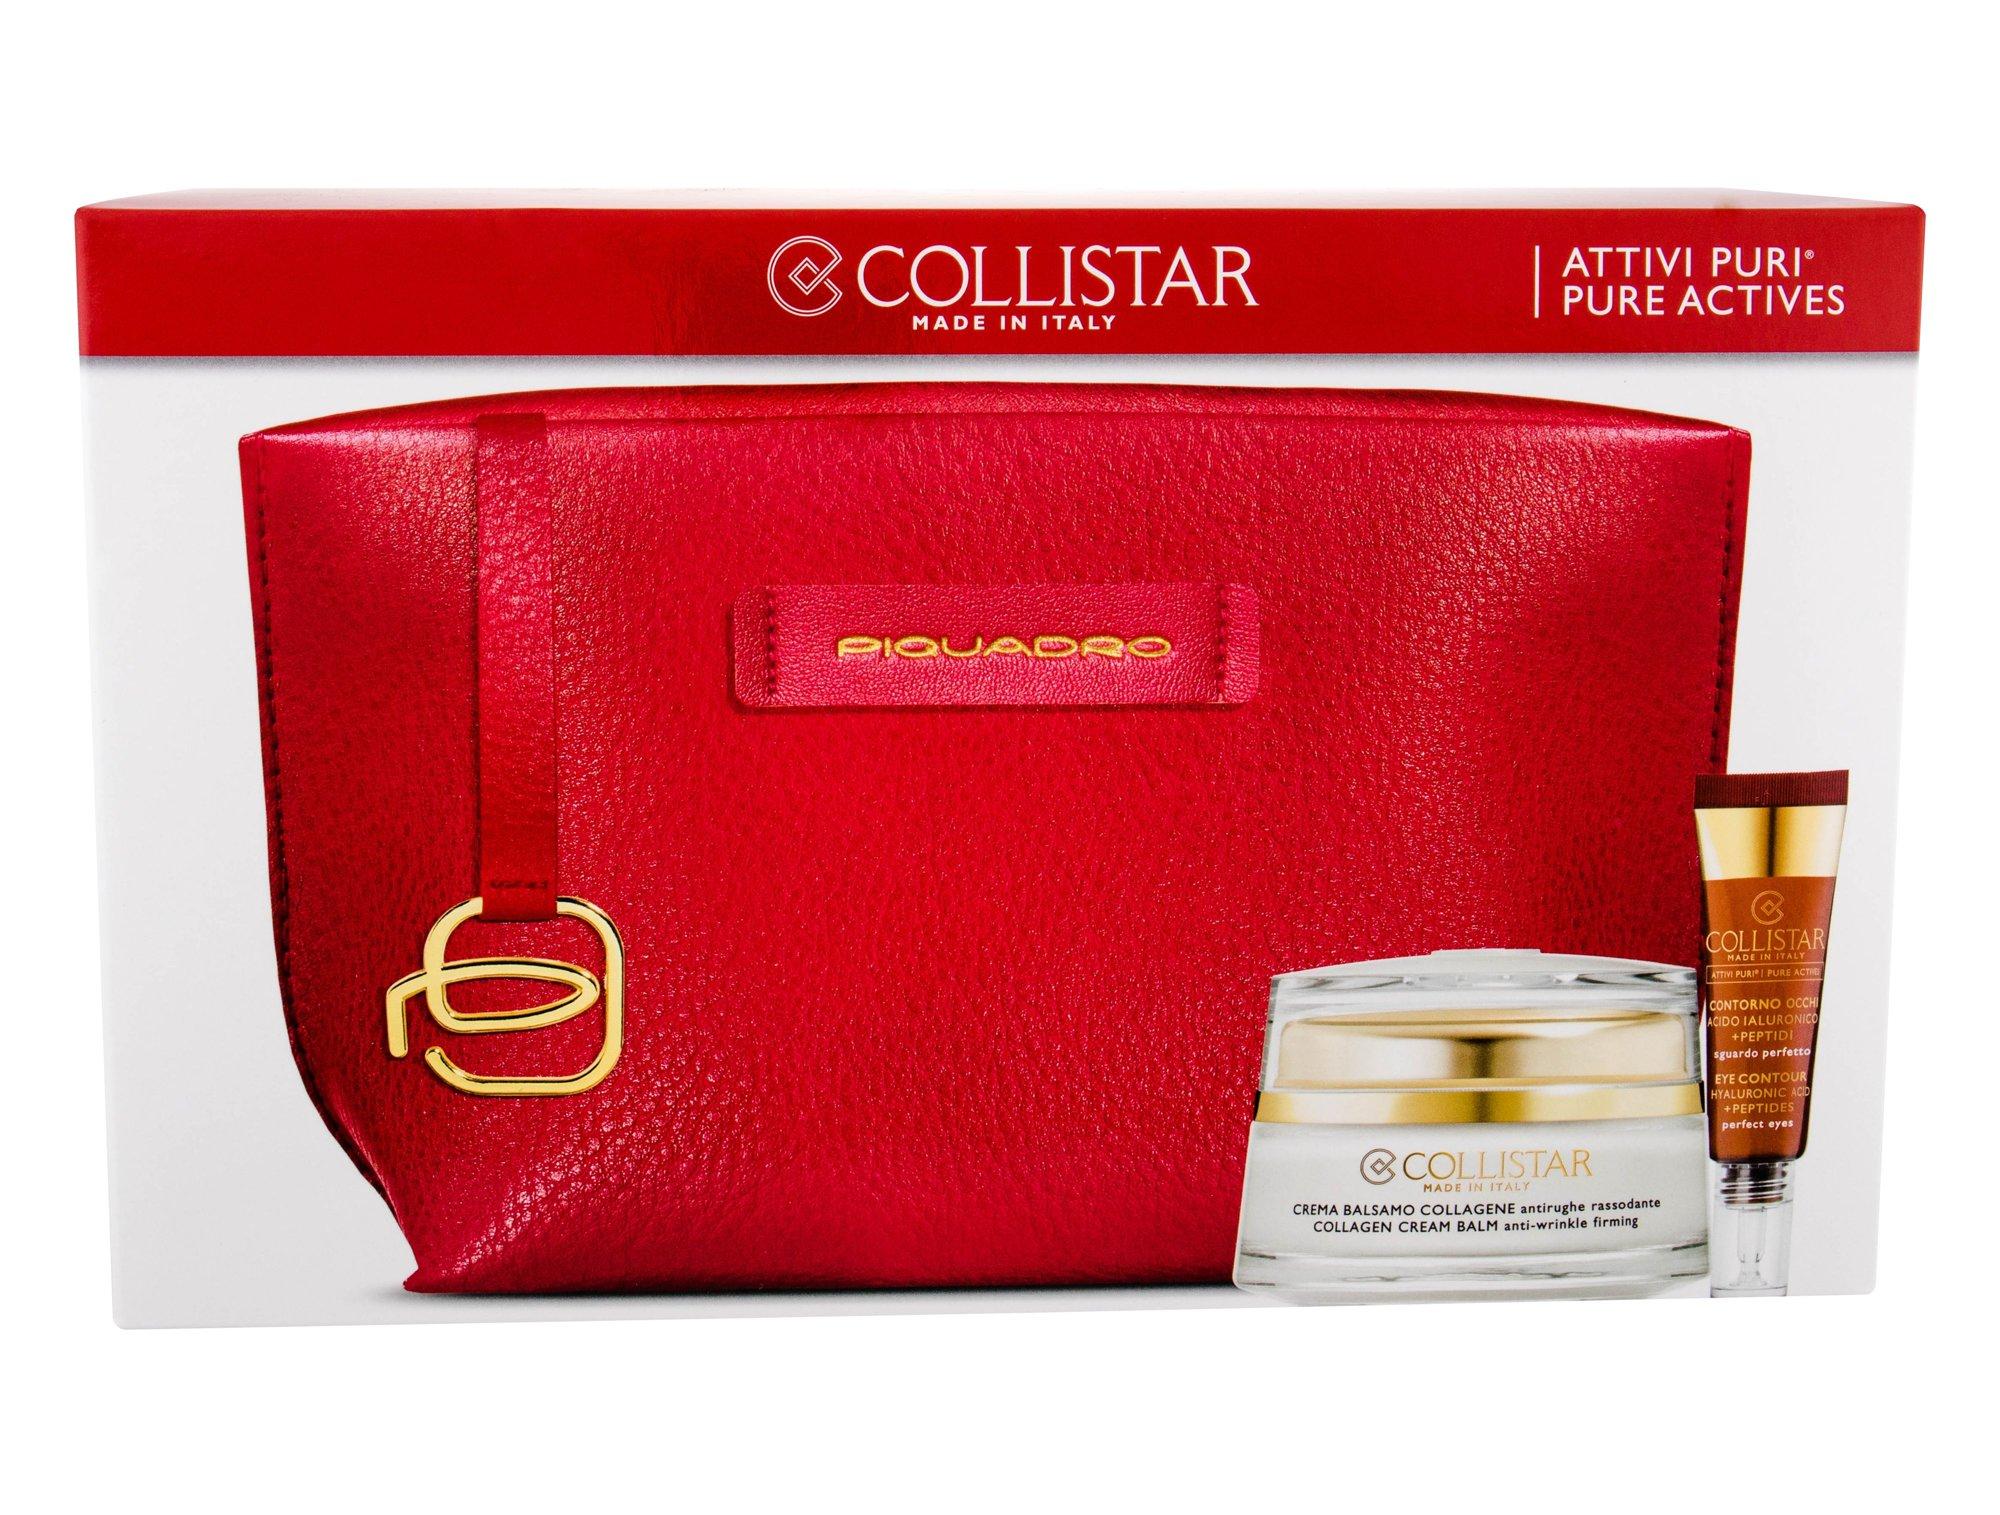 Collistar Pure Actives Day Cream 50ml